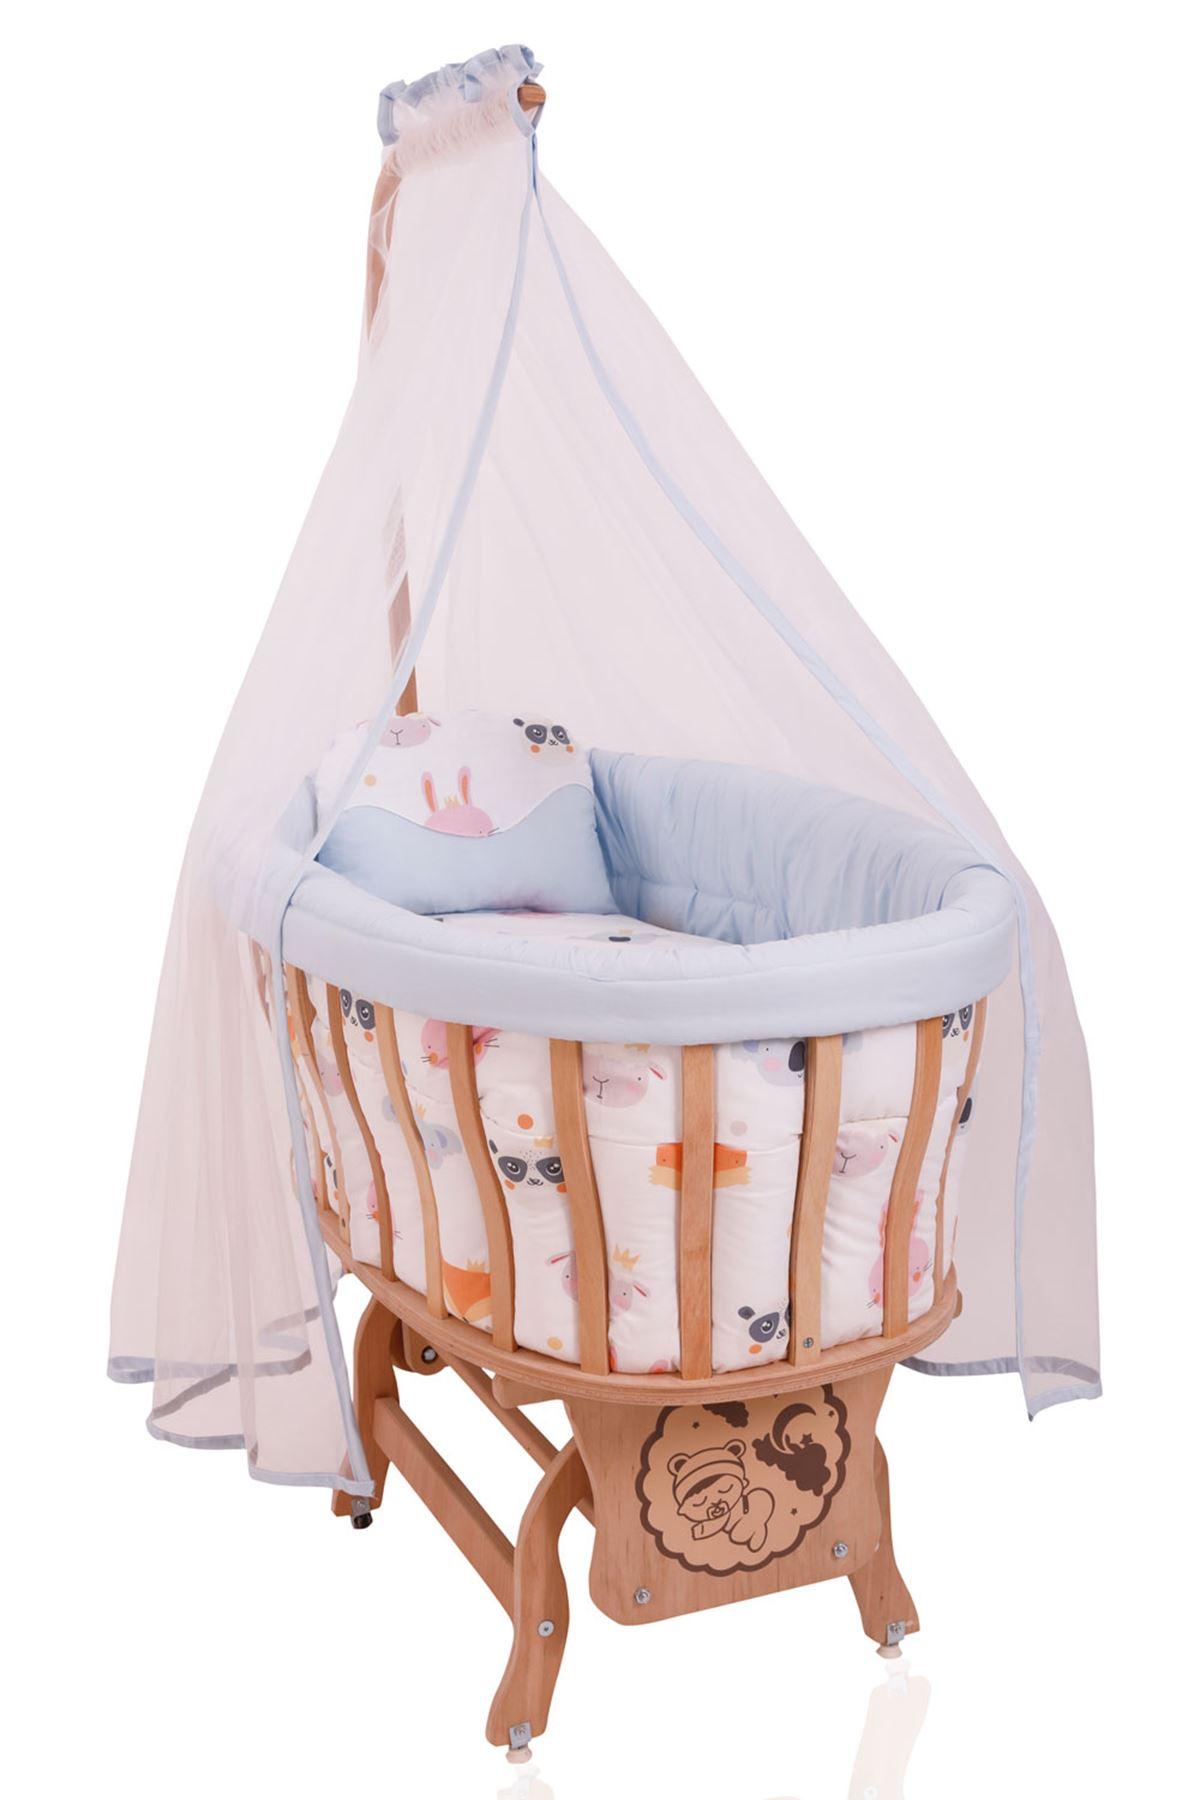 Wooden Baby Crib- Yellow Star Sleeping Set